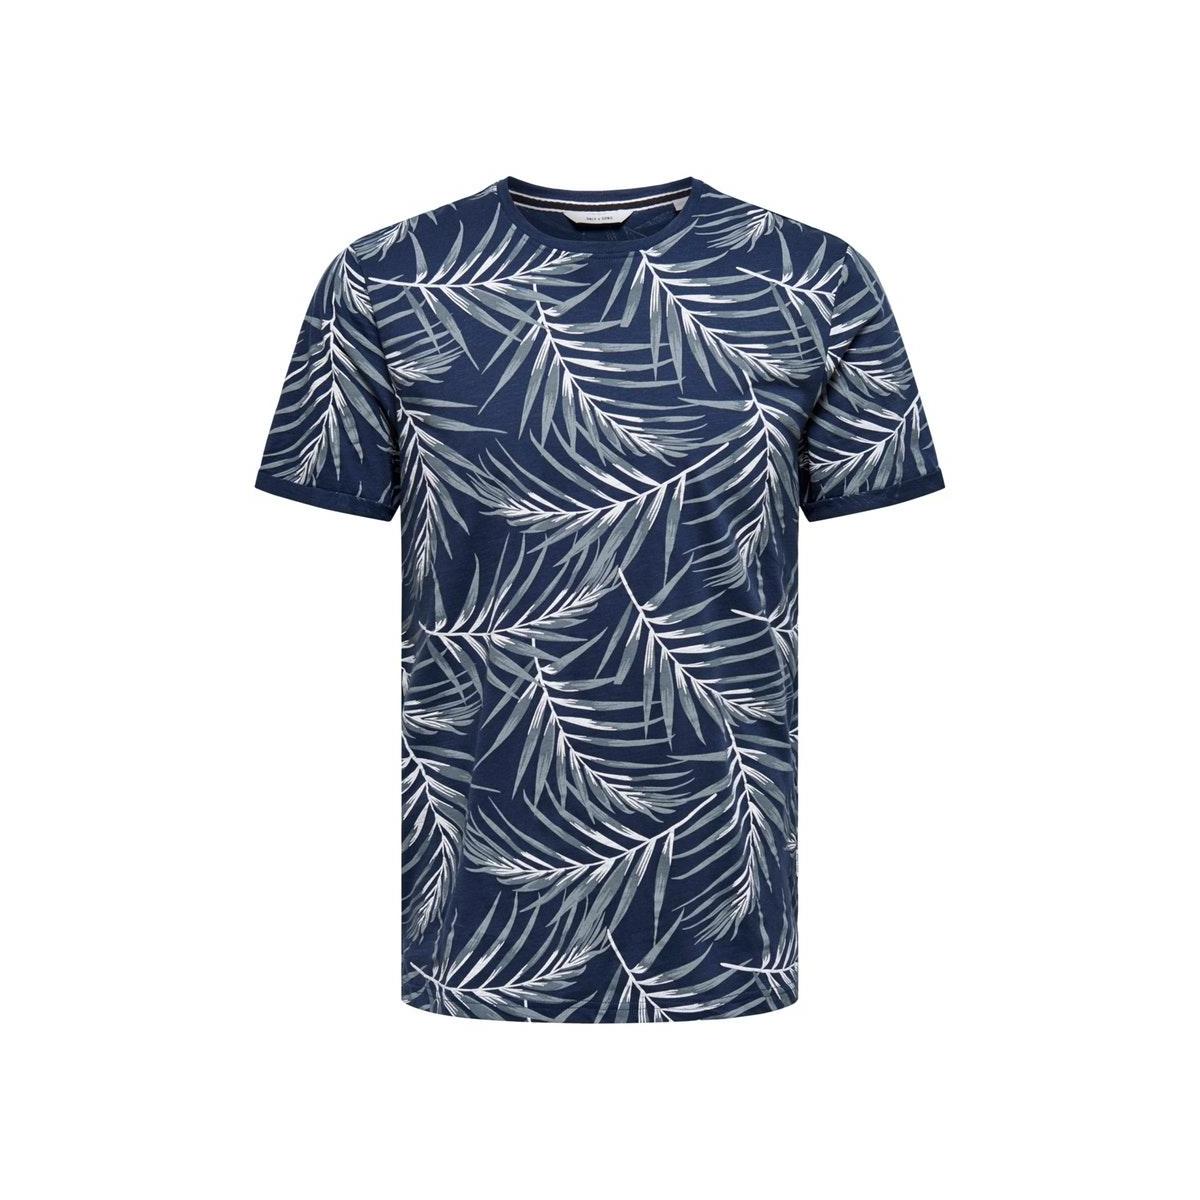 onsiason slim ss aop tee noos 22016762 only & sons t-shirt dress blues